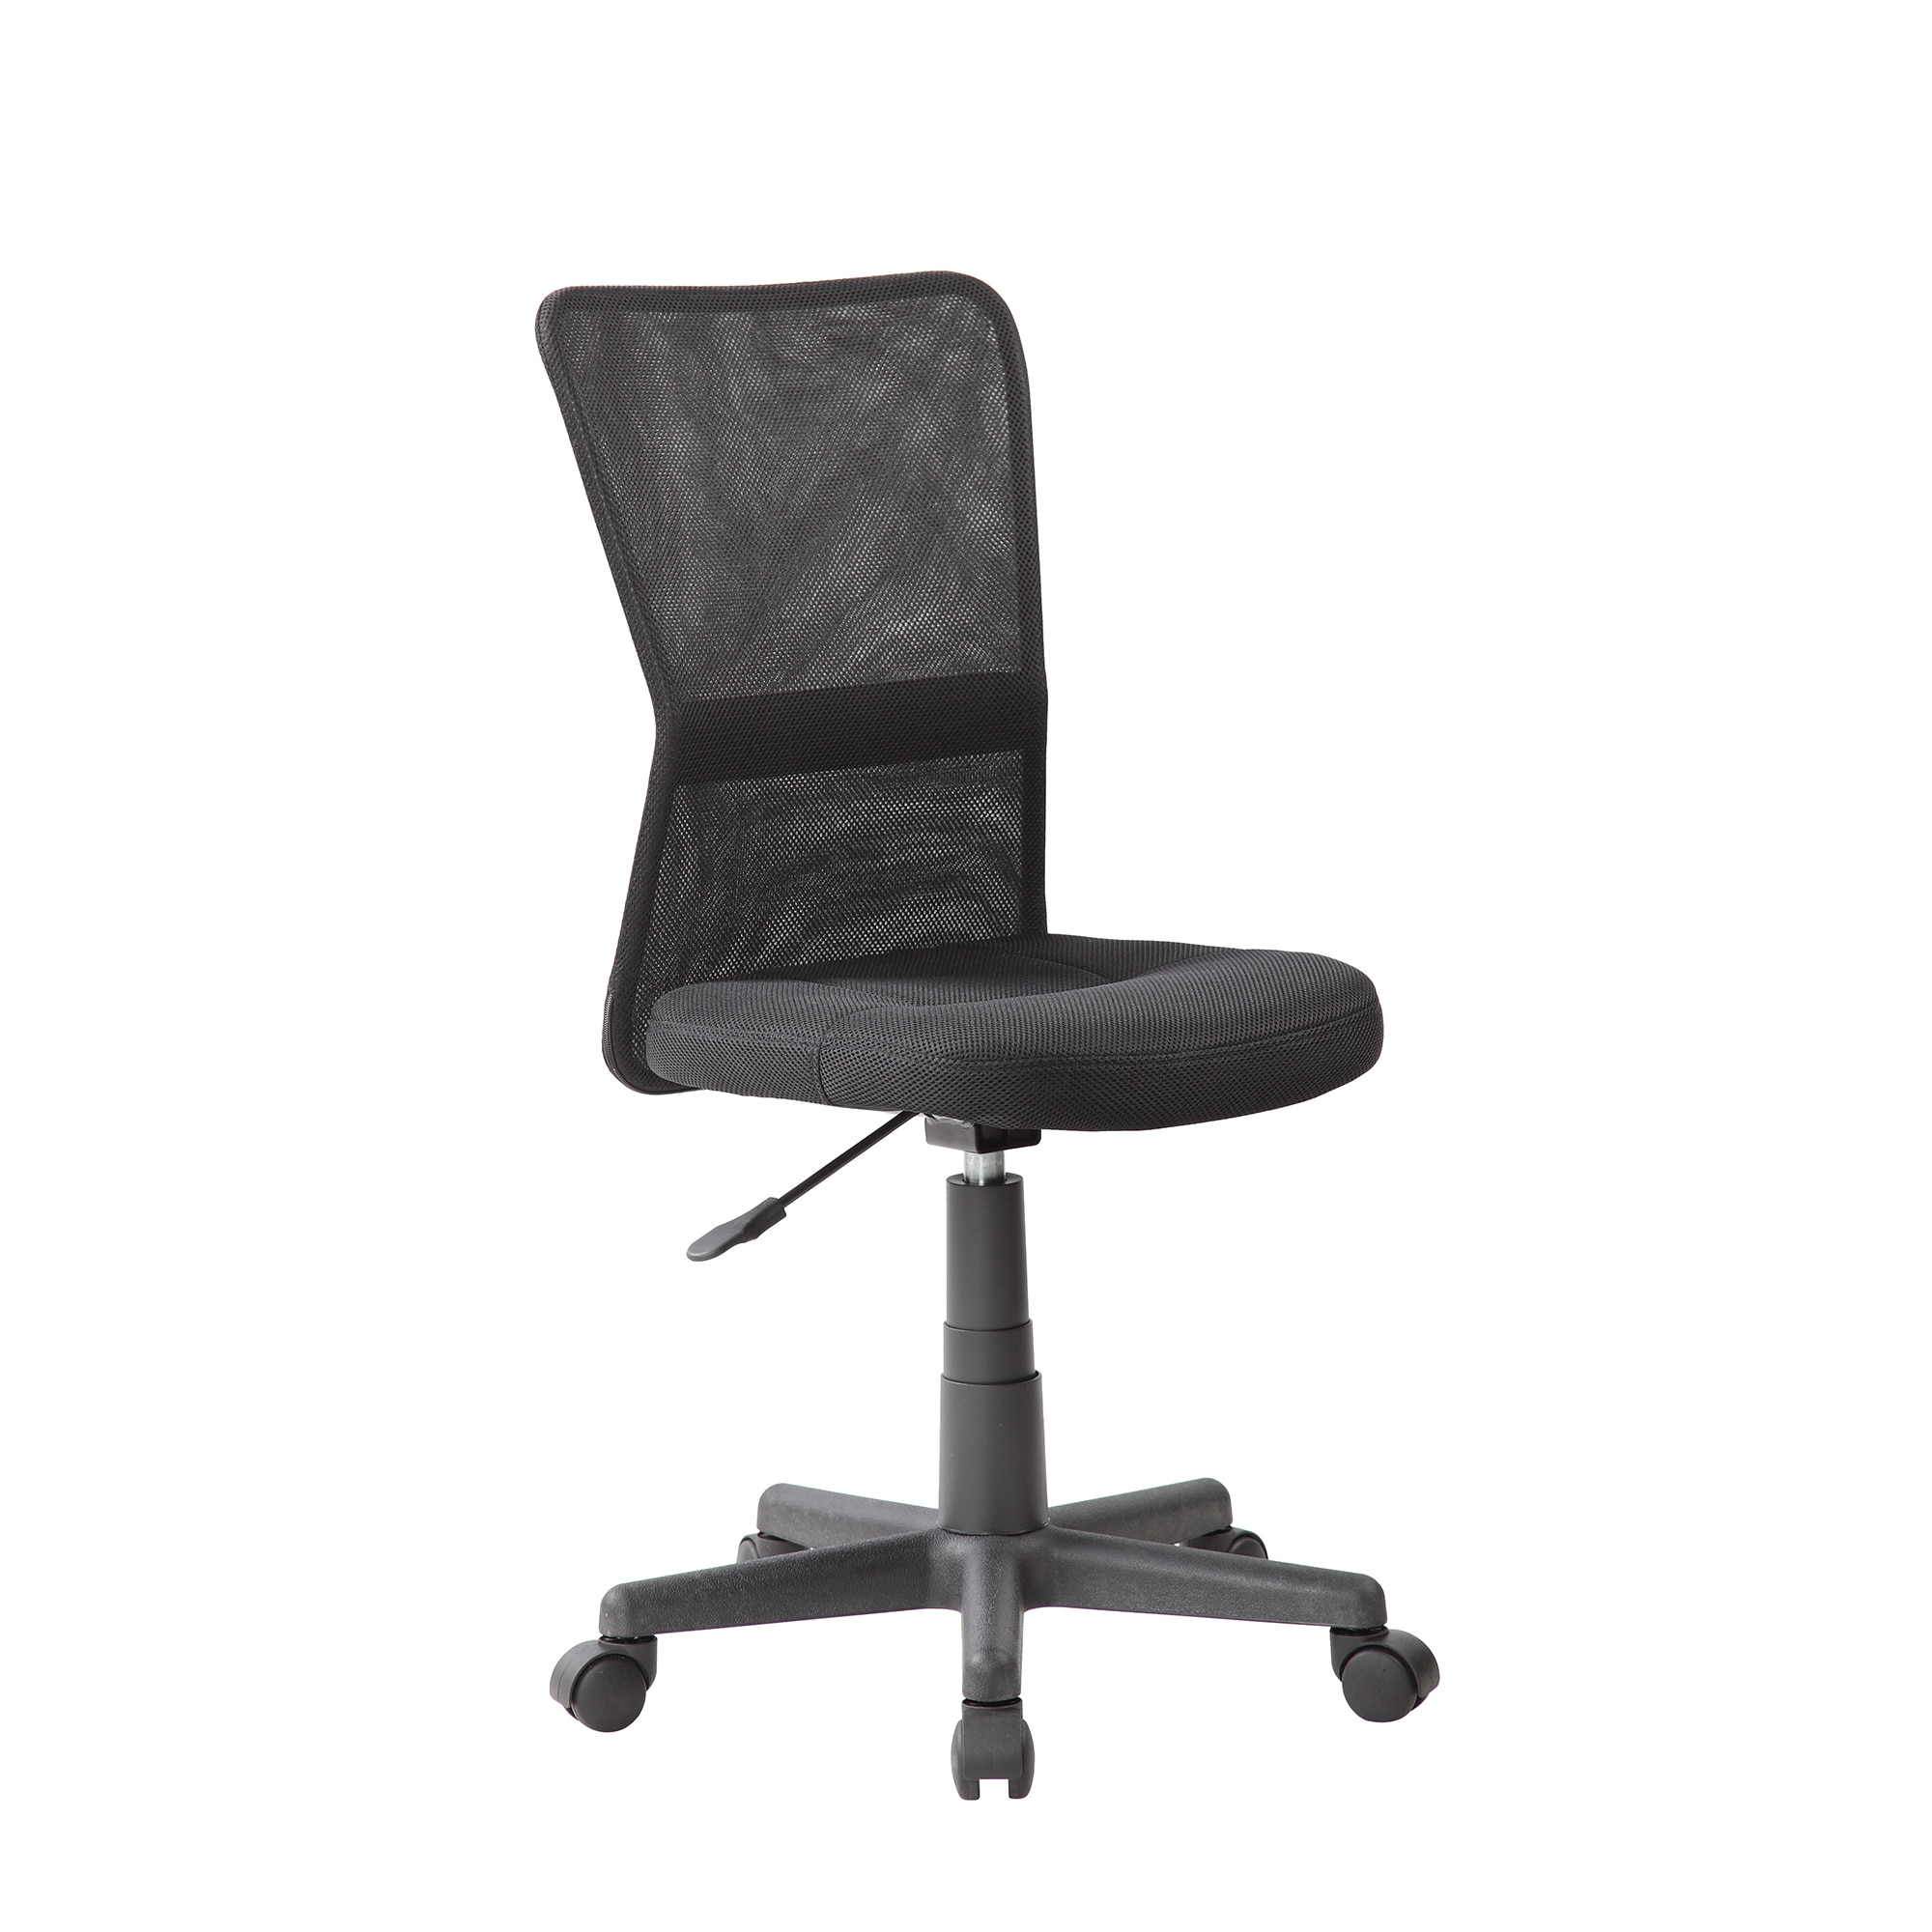 Kring Kor Irodai szék, Szürke eMAG.hu